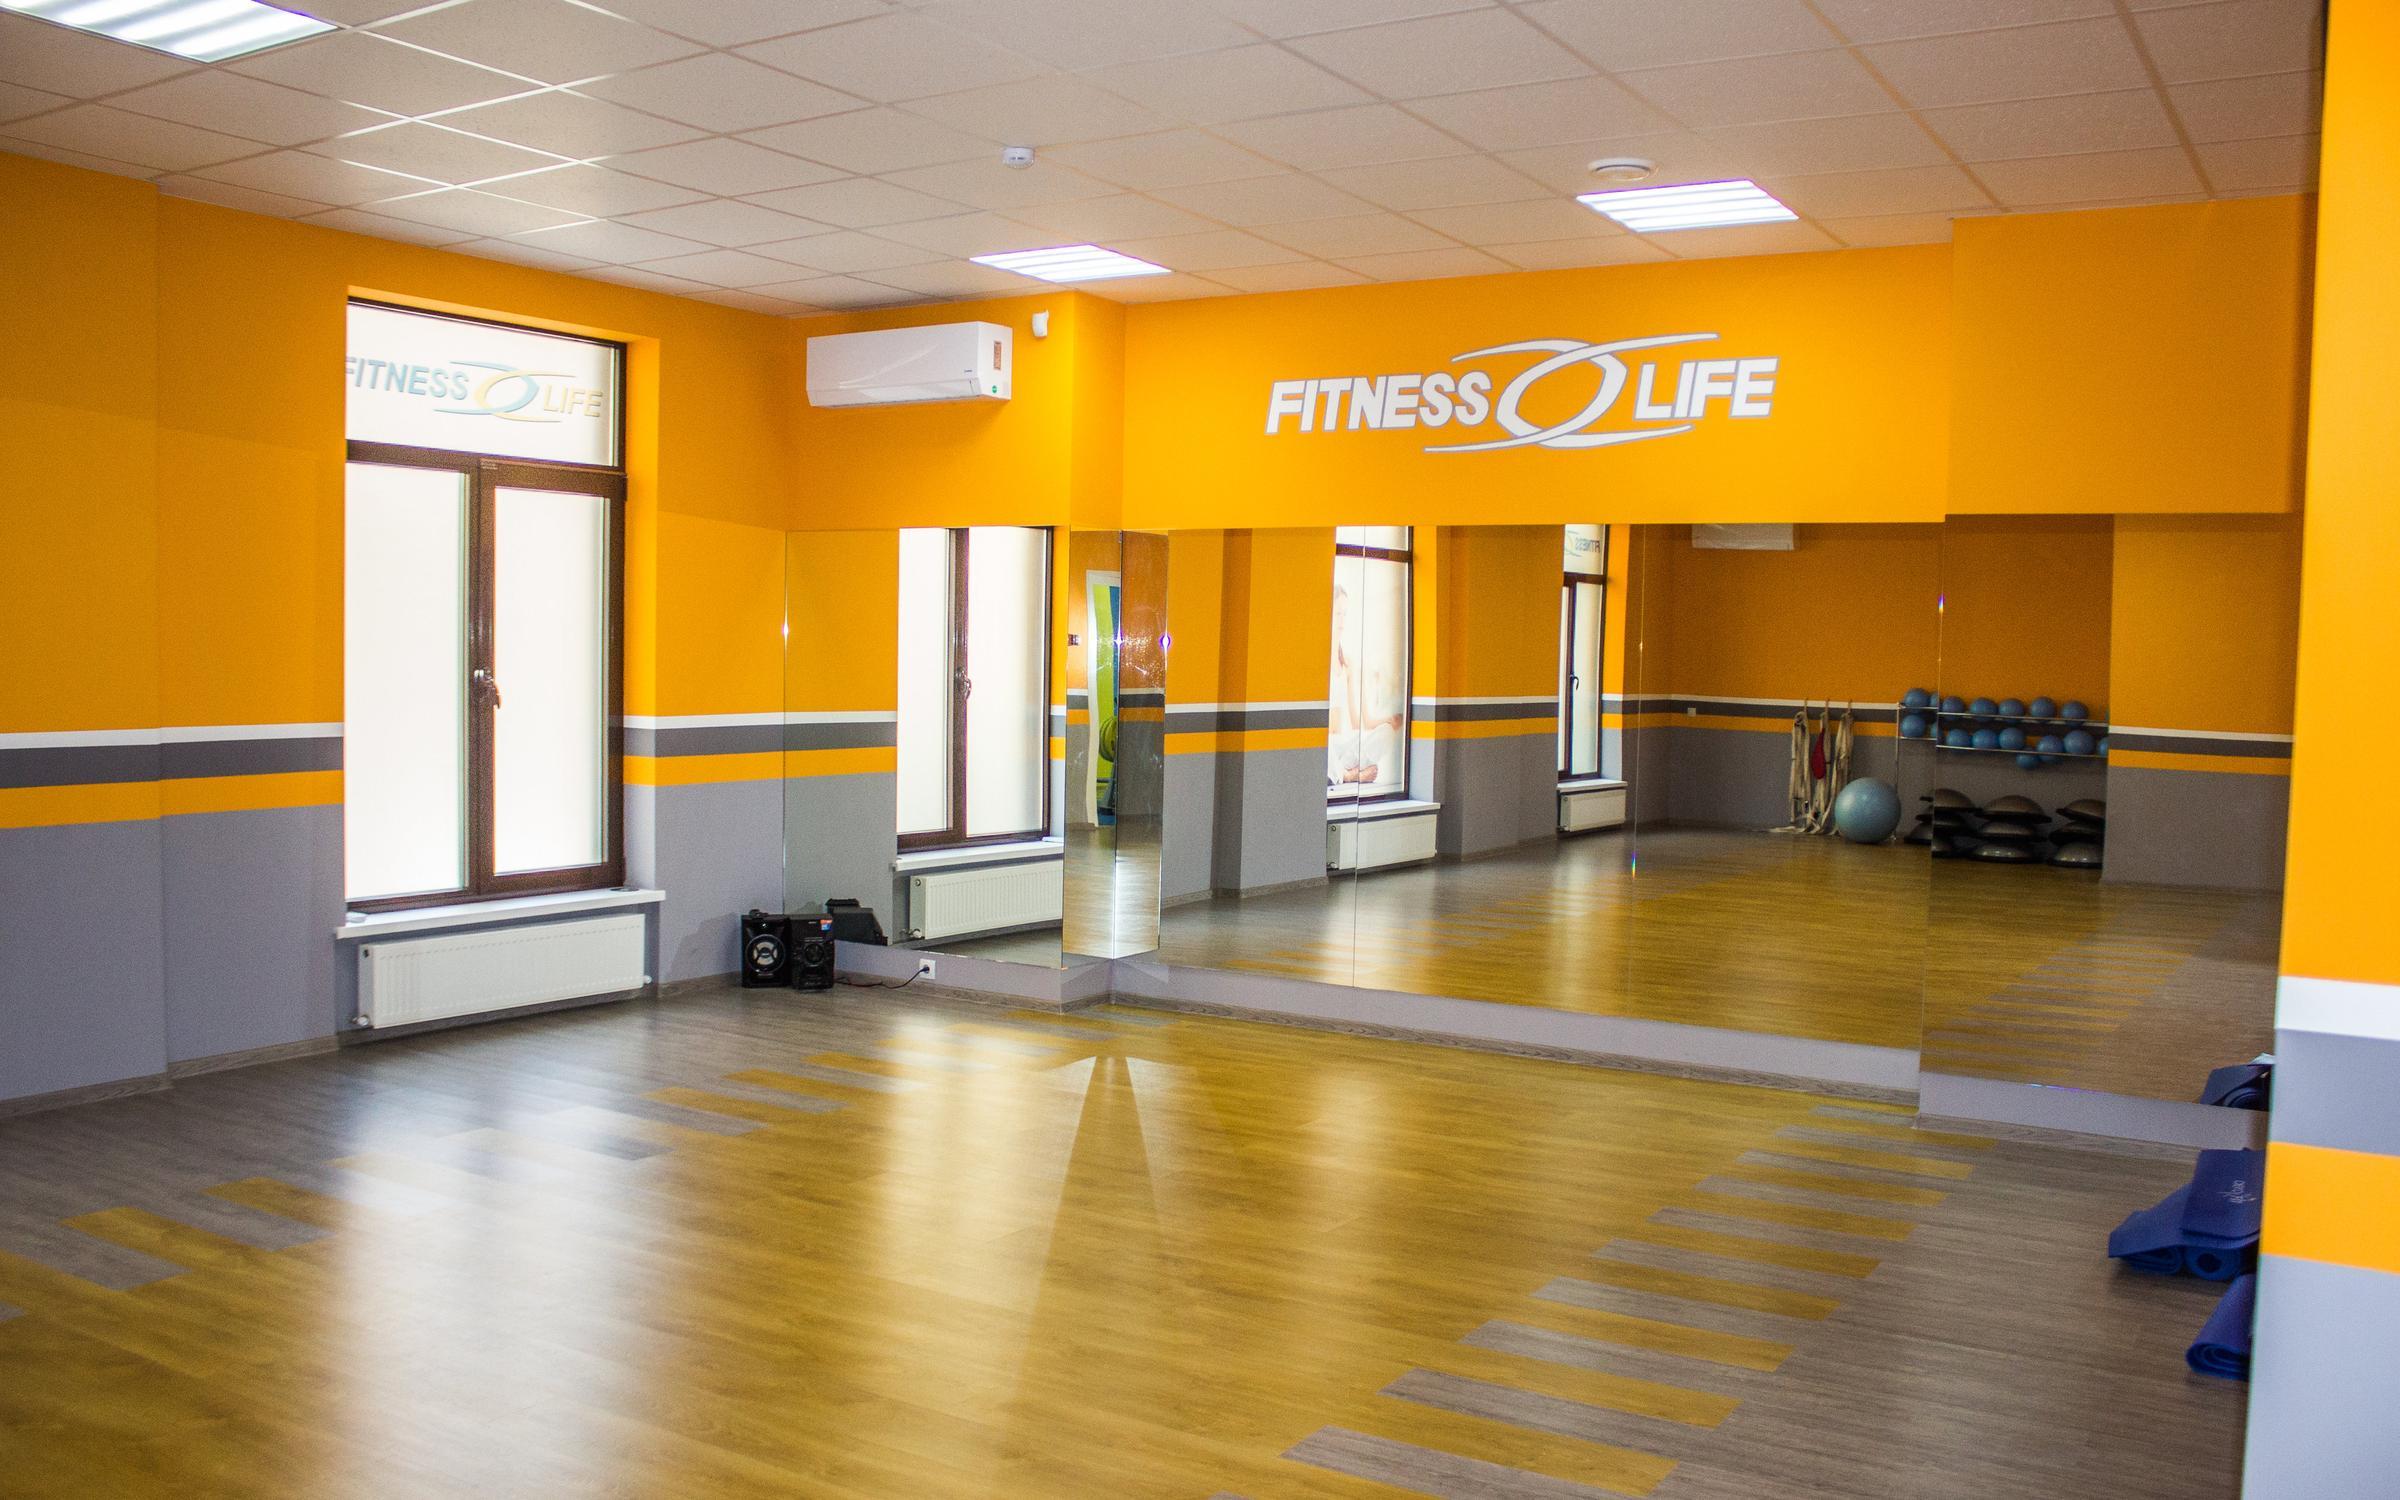 фотография Фитнес-клуба Fitness Life на улице Прокофьева